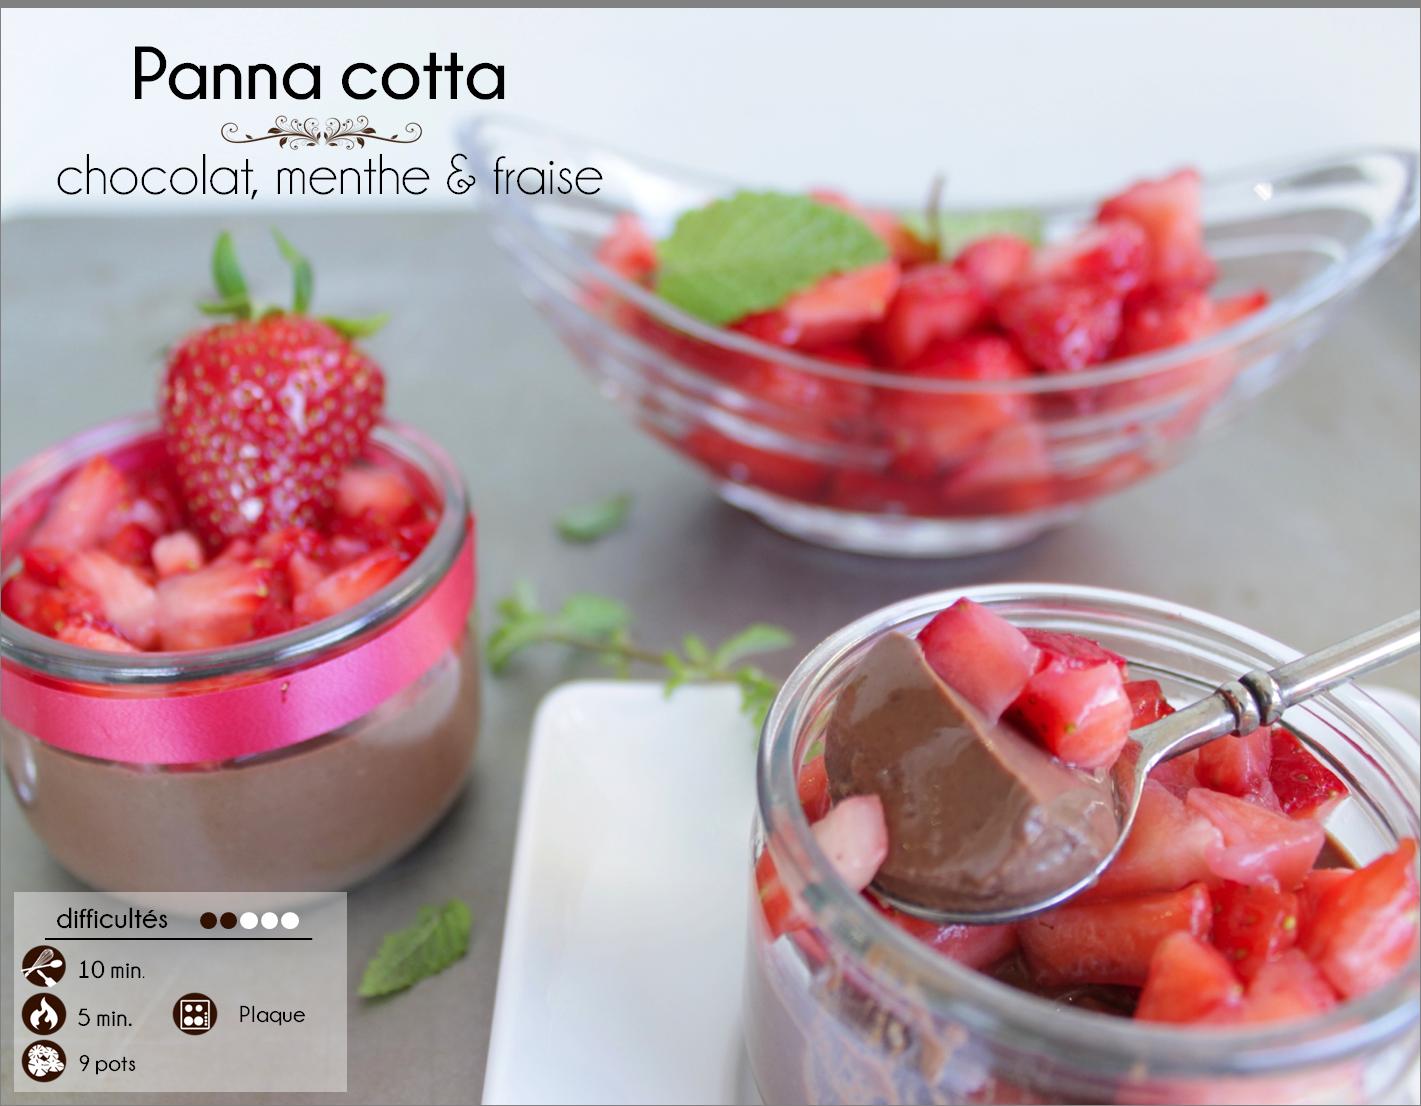 panna cotta chocolat menthe fraise